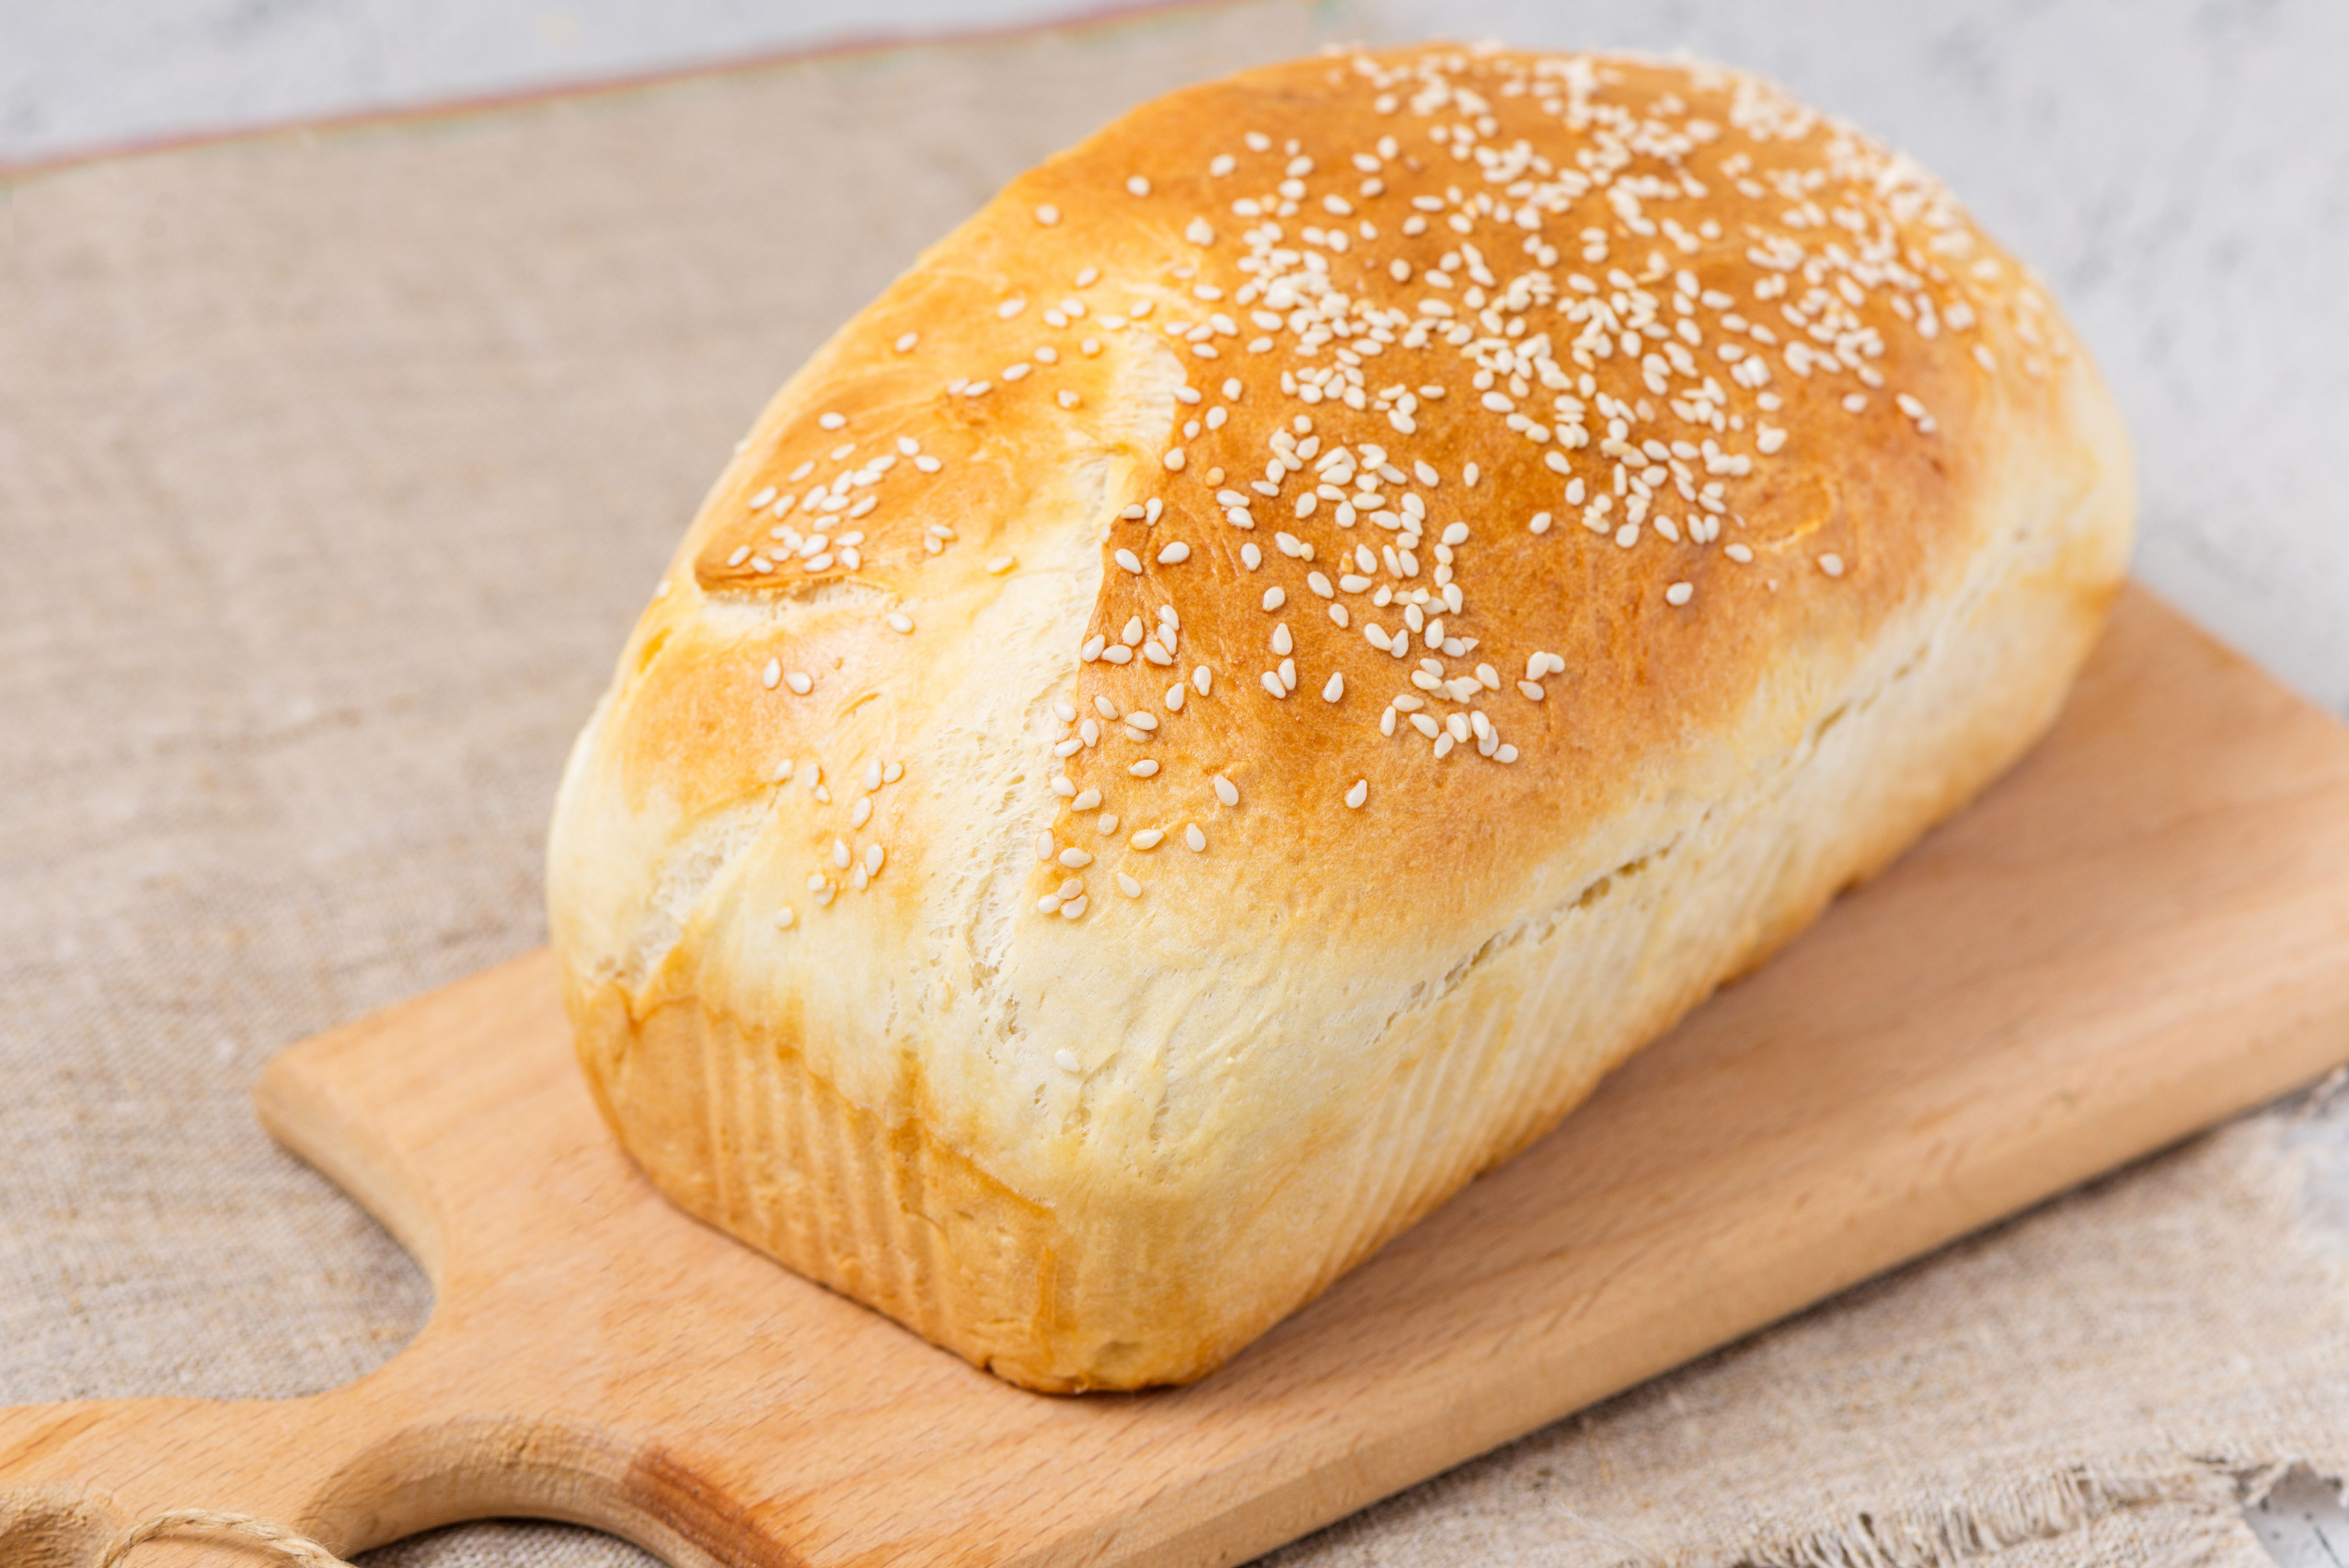 Freshly baked loaf of honey buttermilk bread